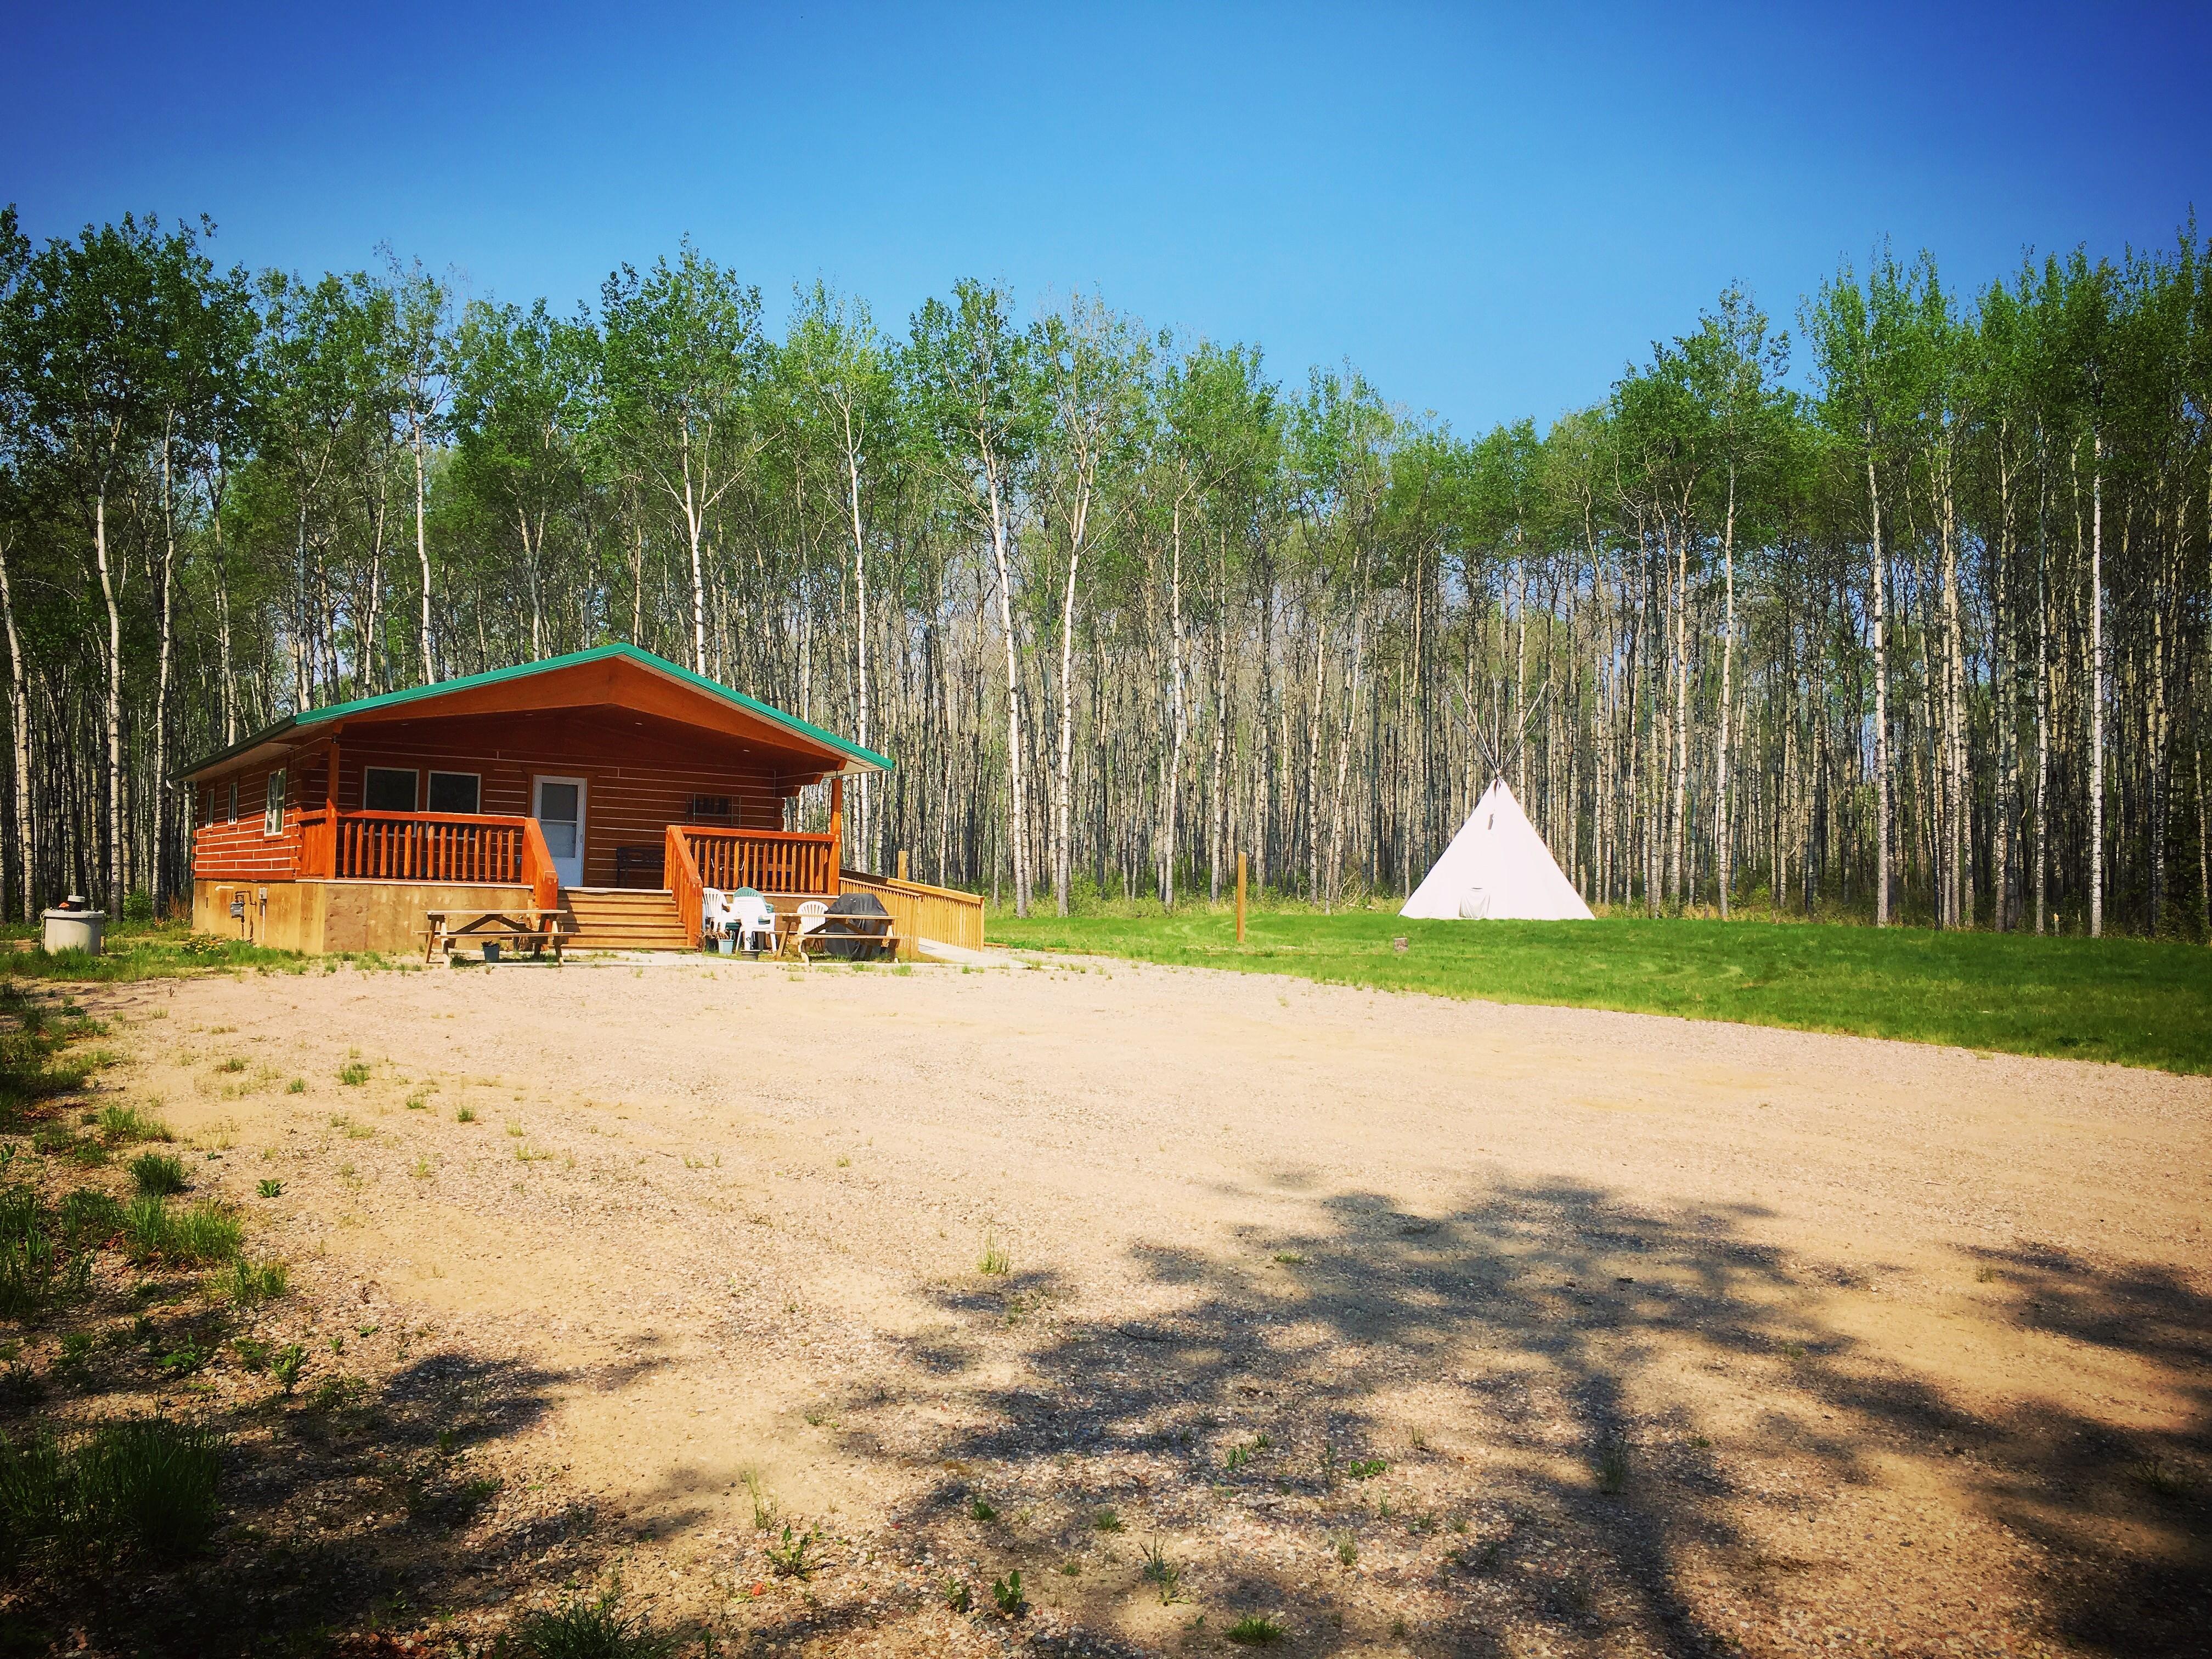 LCFASD Cabins